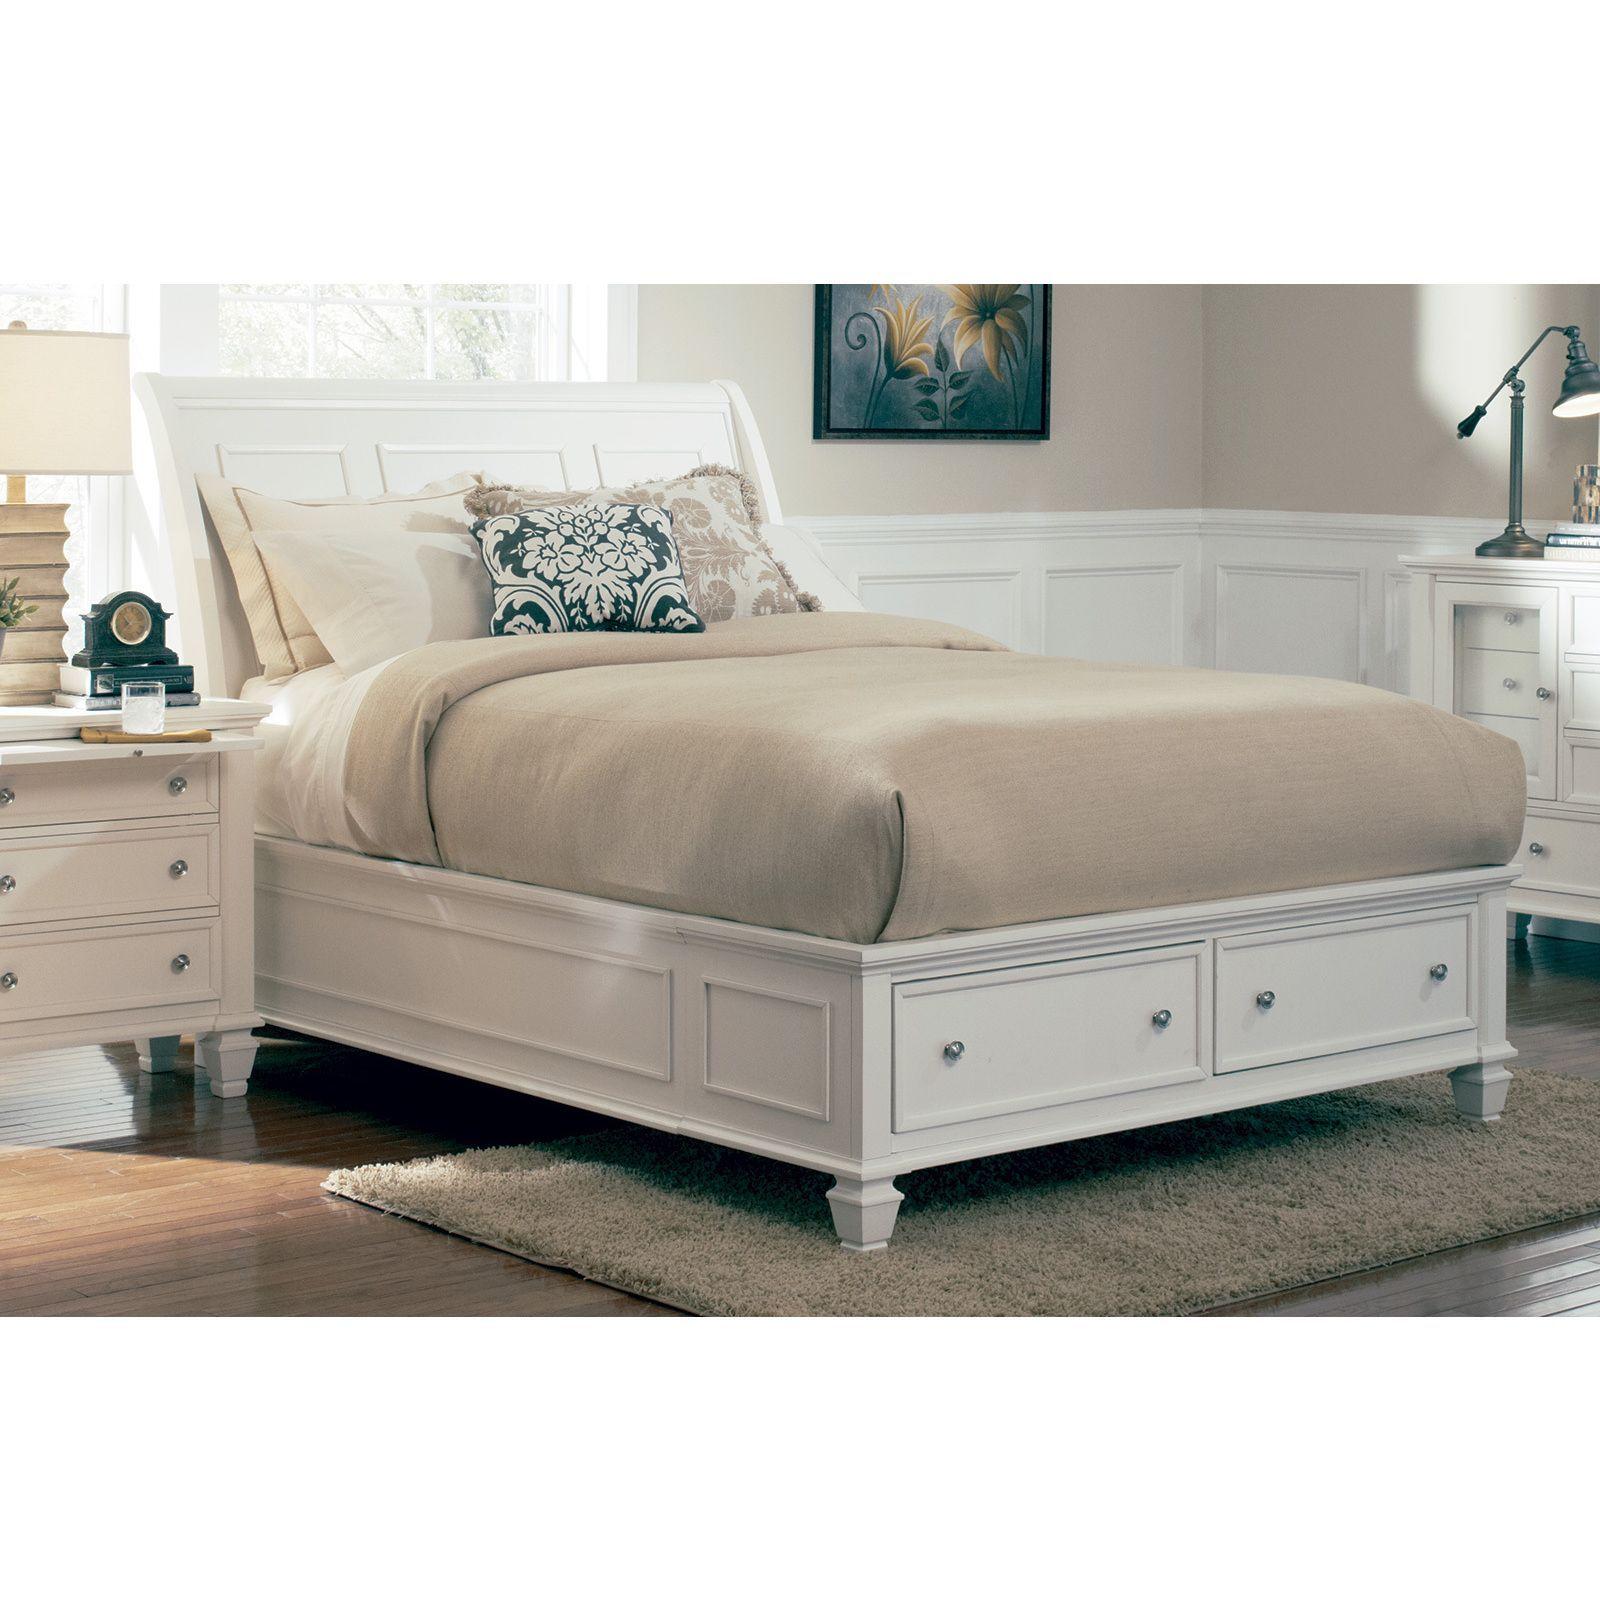 Coaster Company White Panel Bed (California King) White